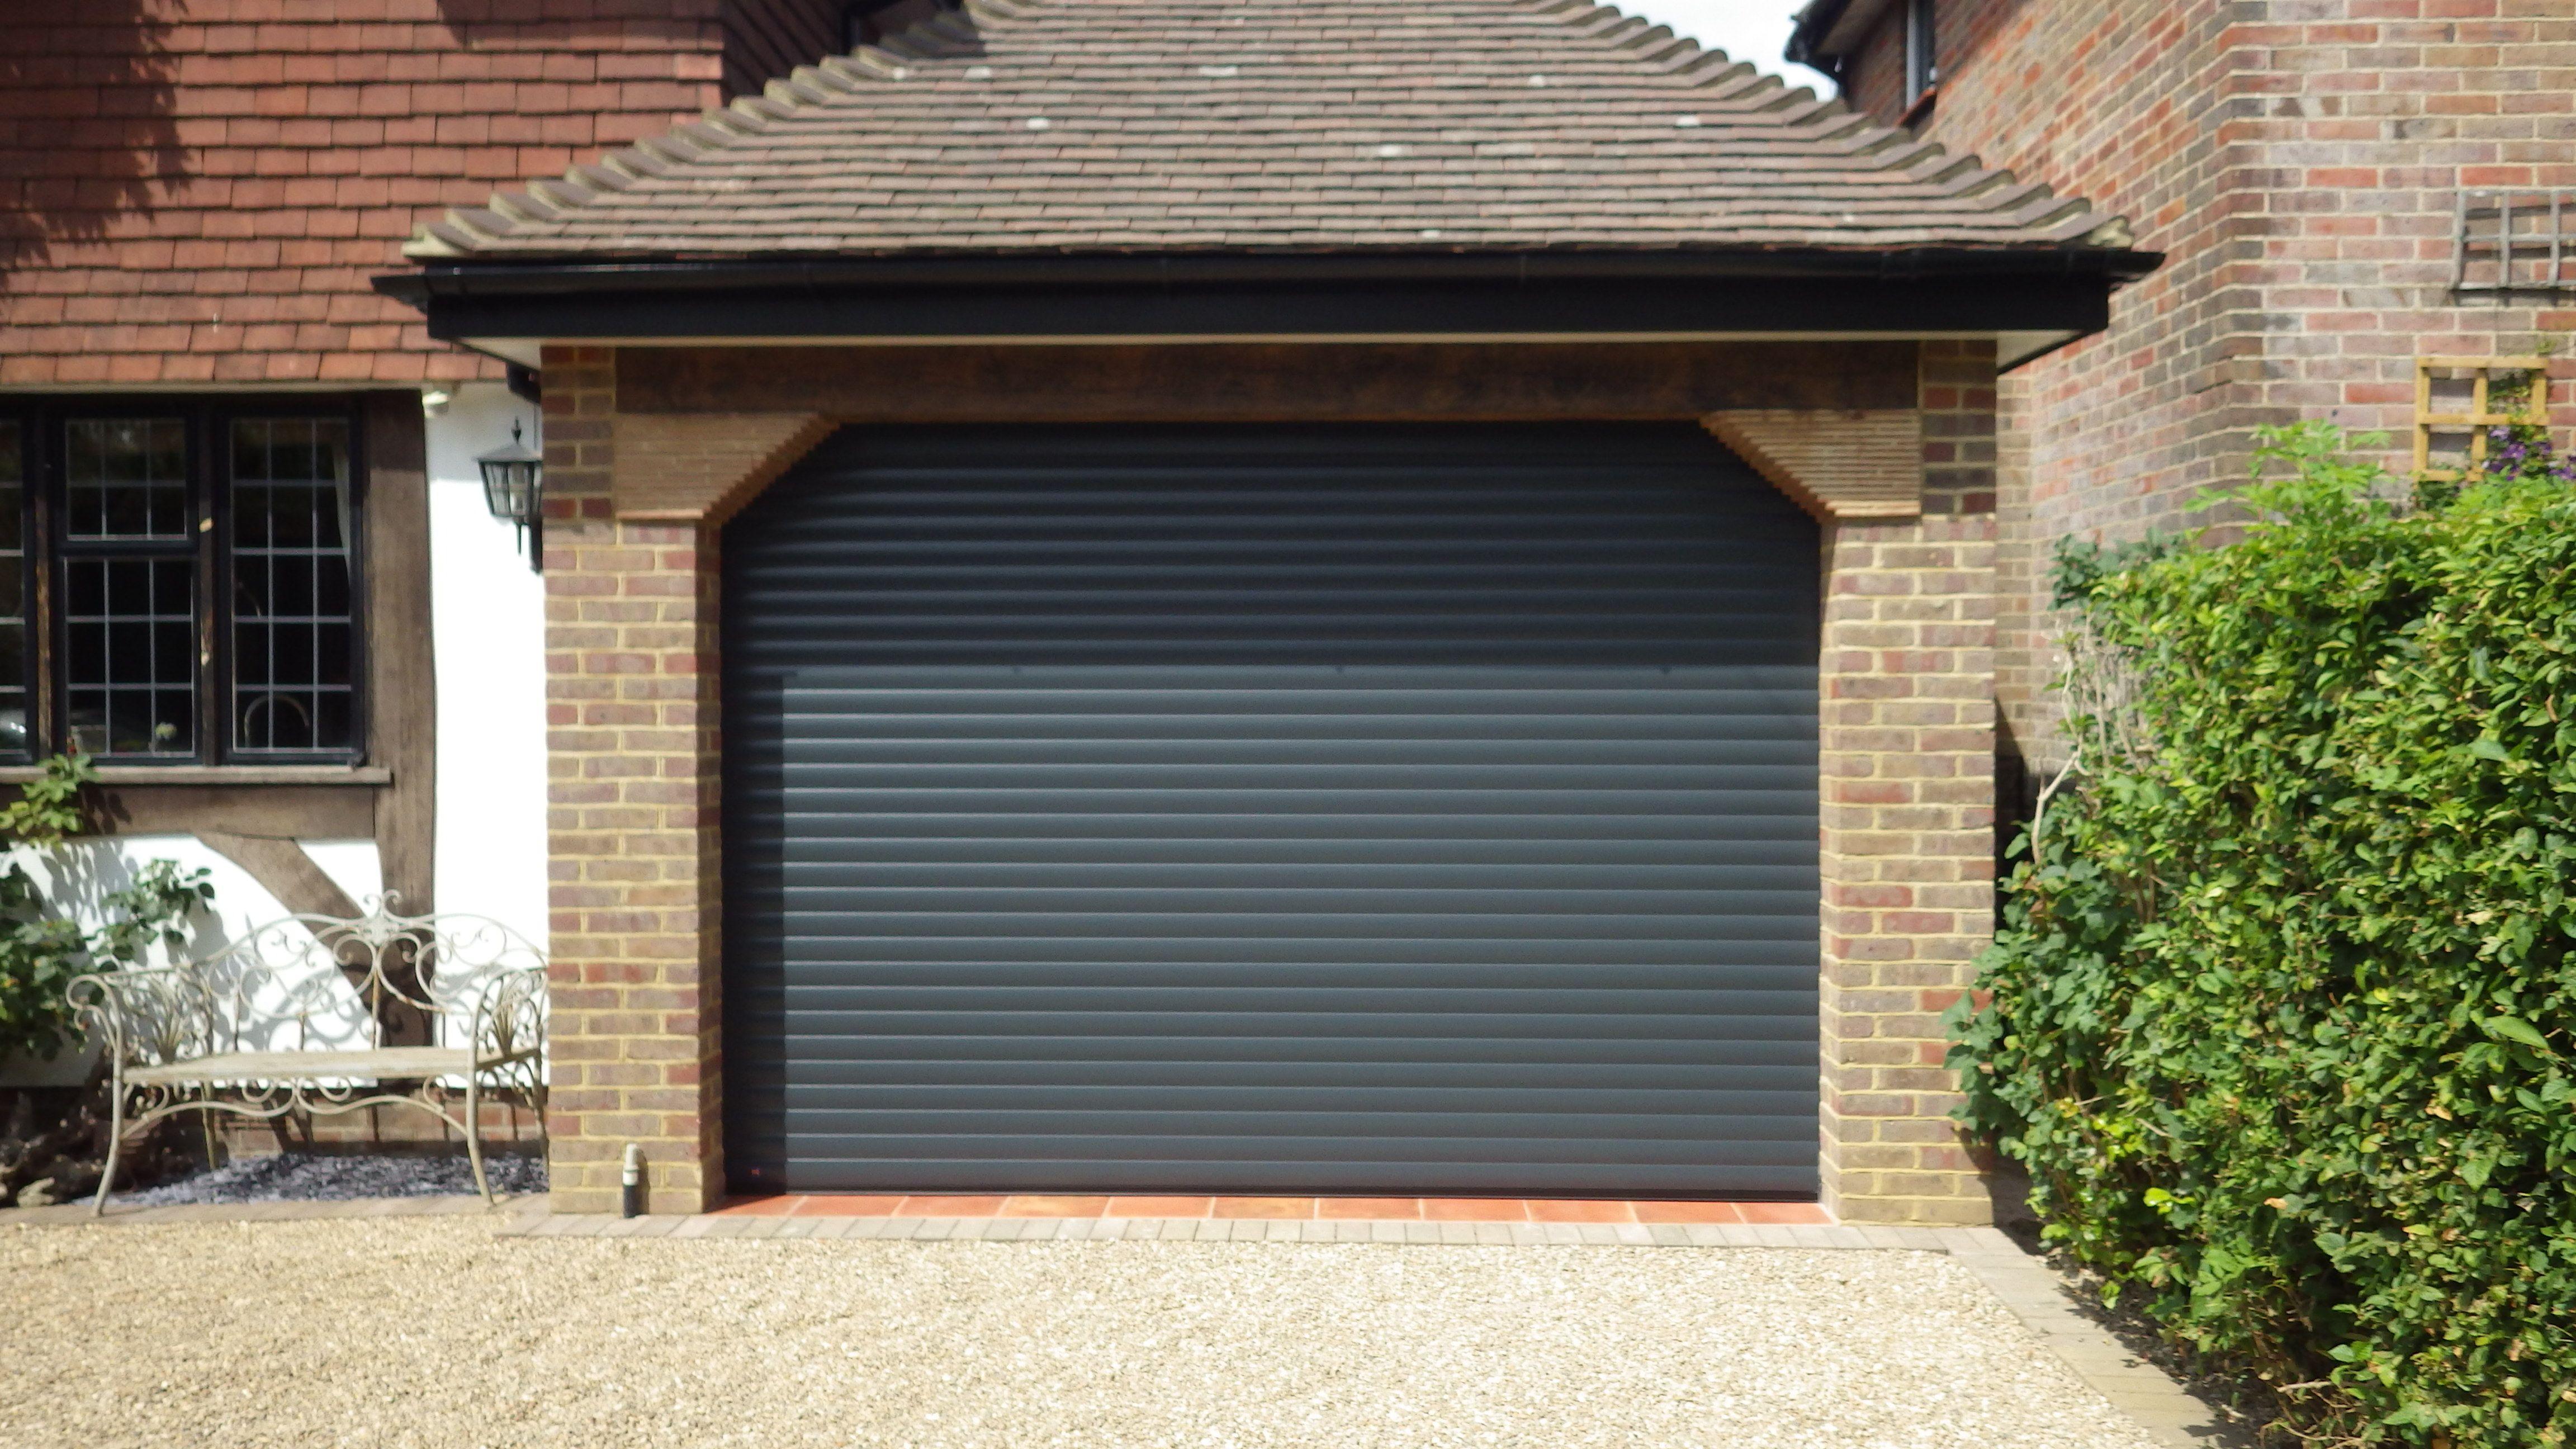 Hormann rollmatic garage door in anthracite grey finish for Garage door finishes